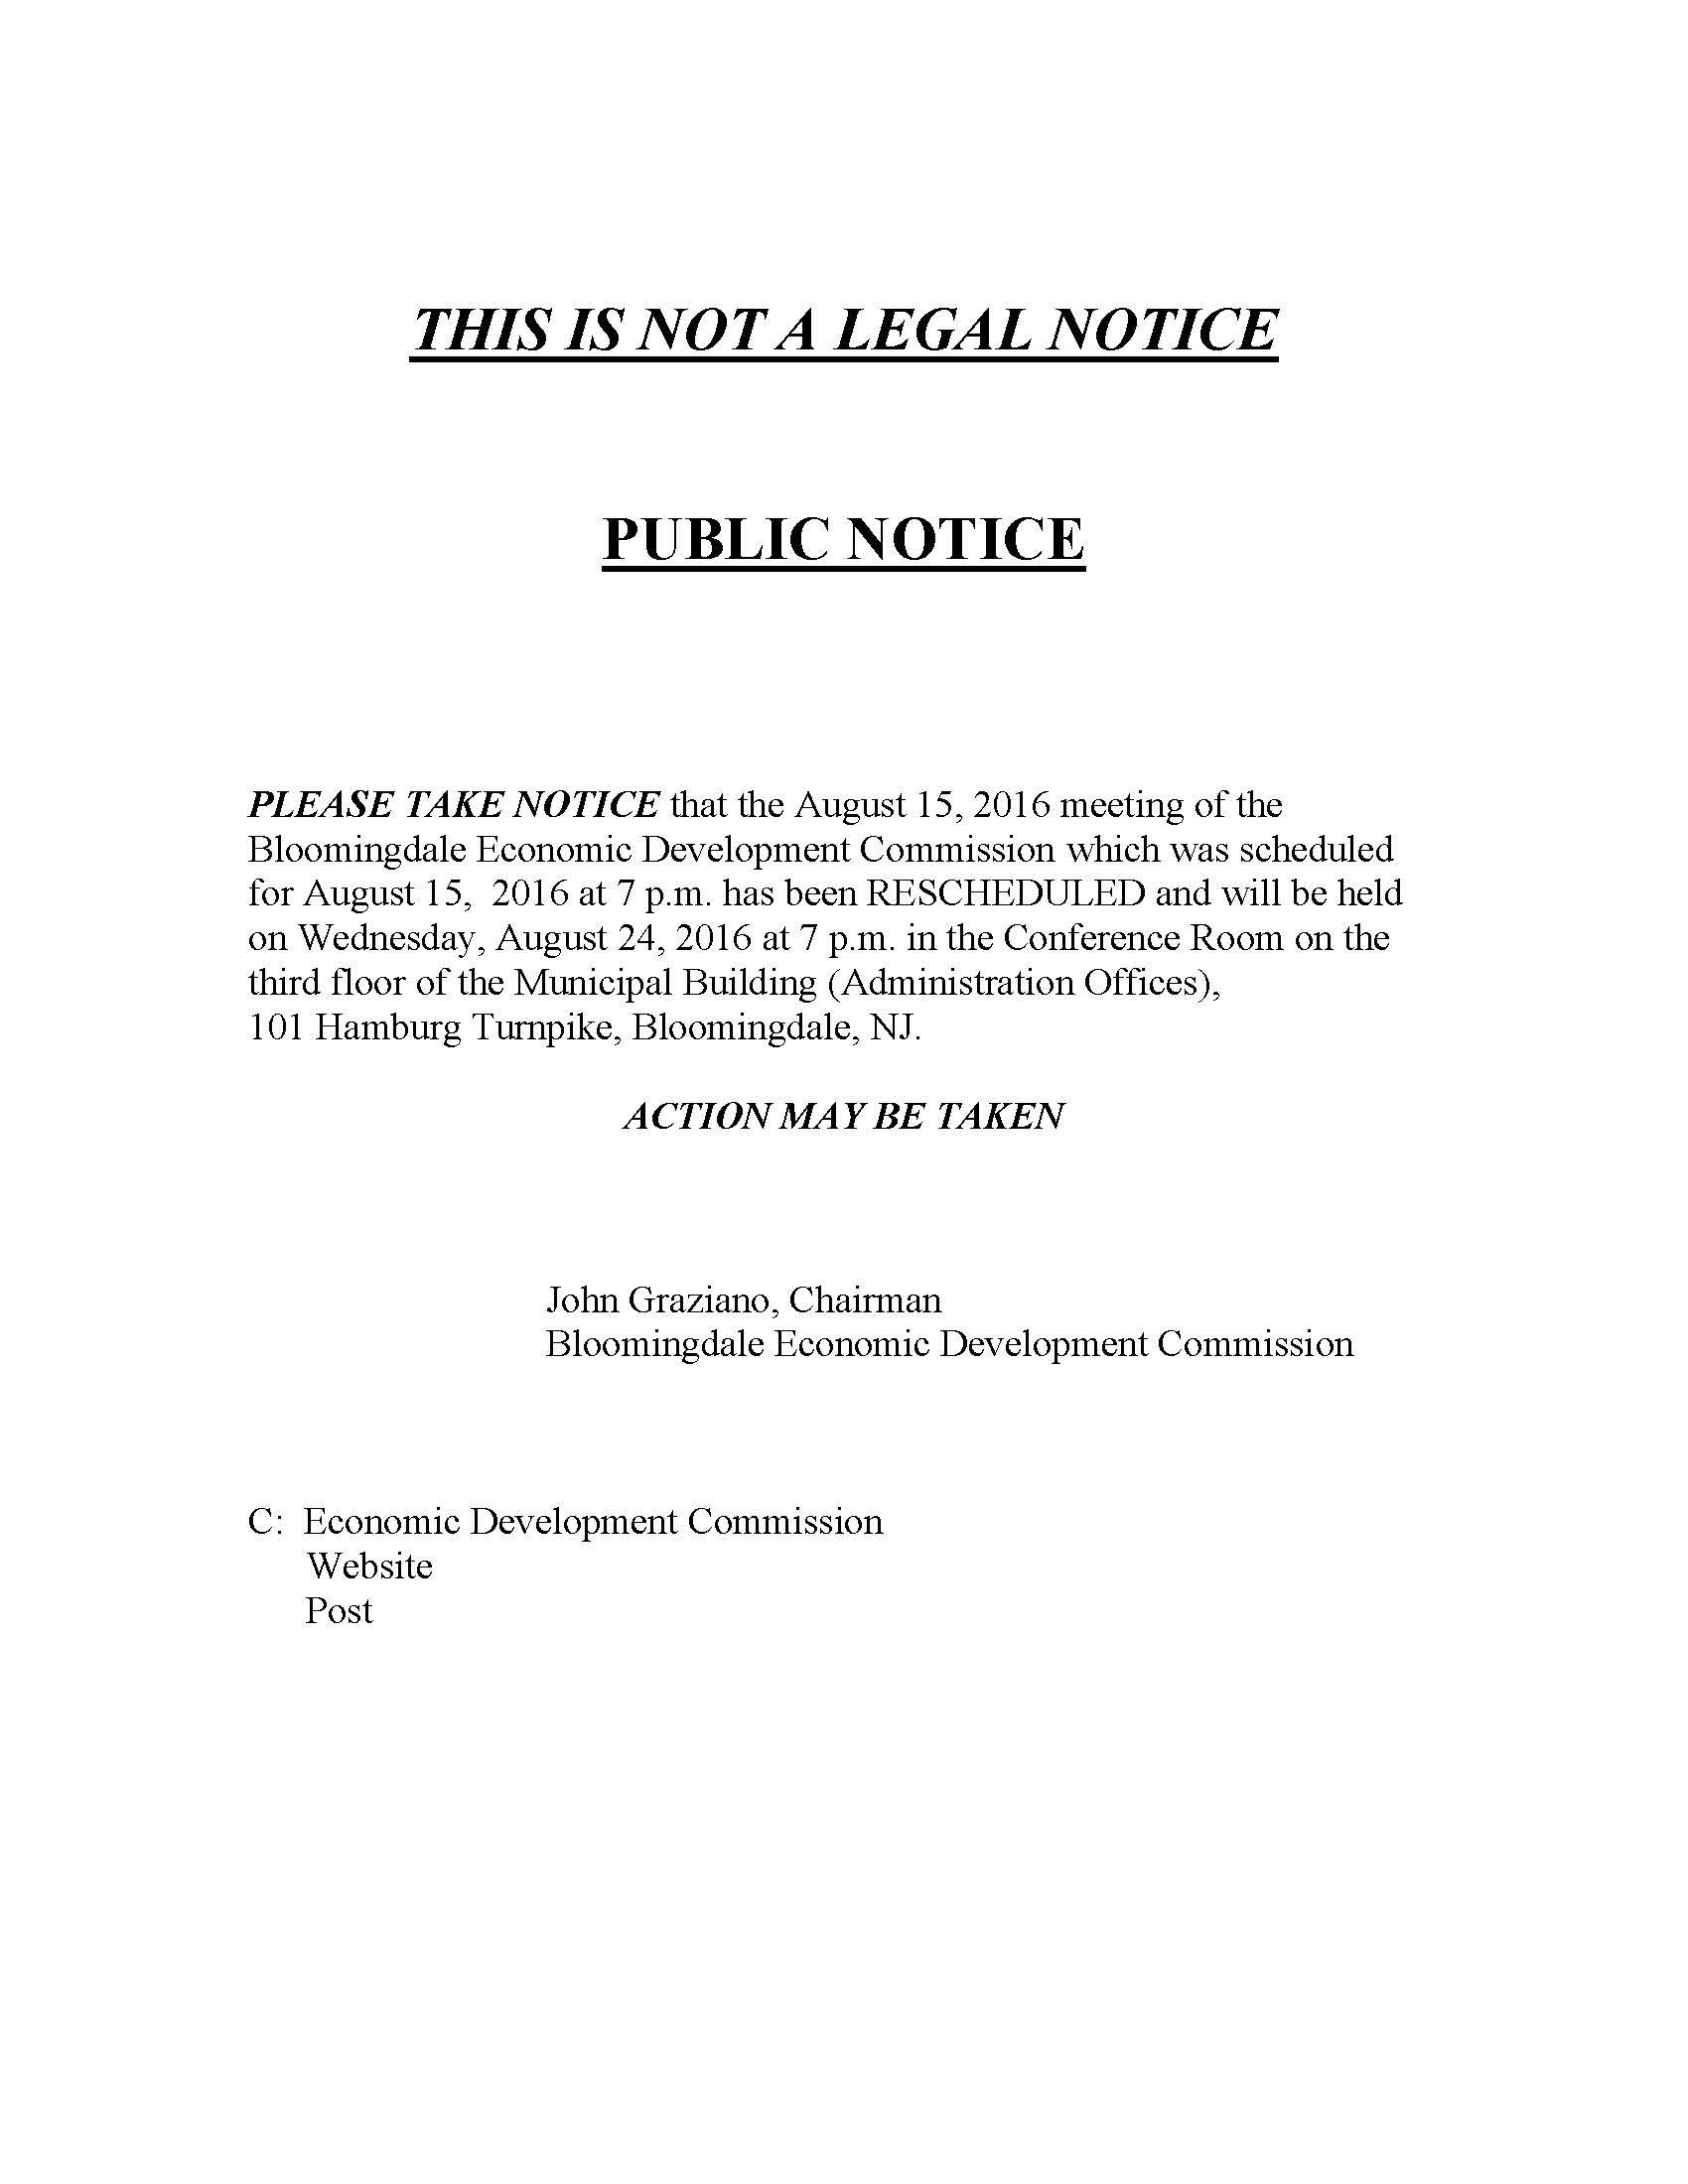 Economic Dev  Meeting Rescheduled - Borough of Bloomingdale News